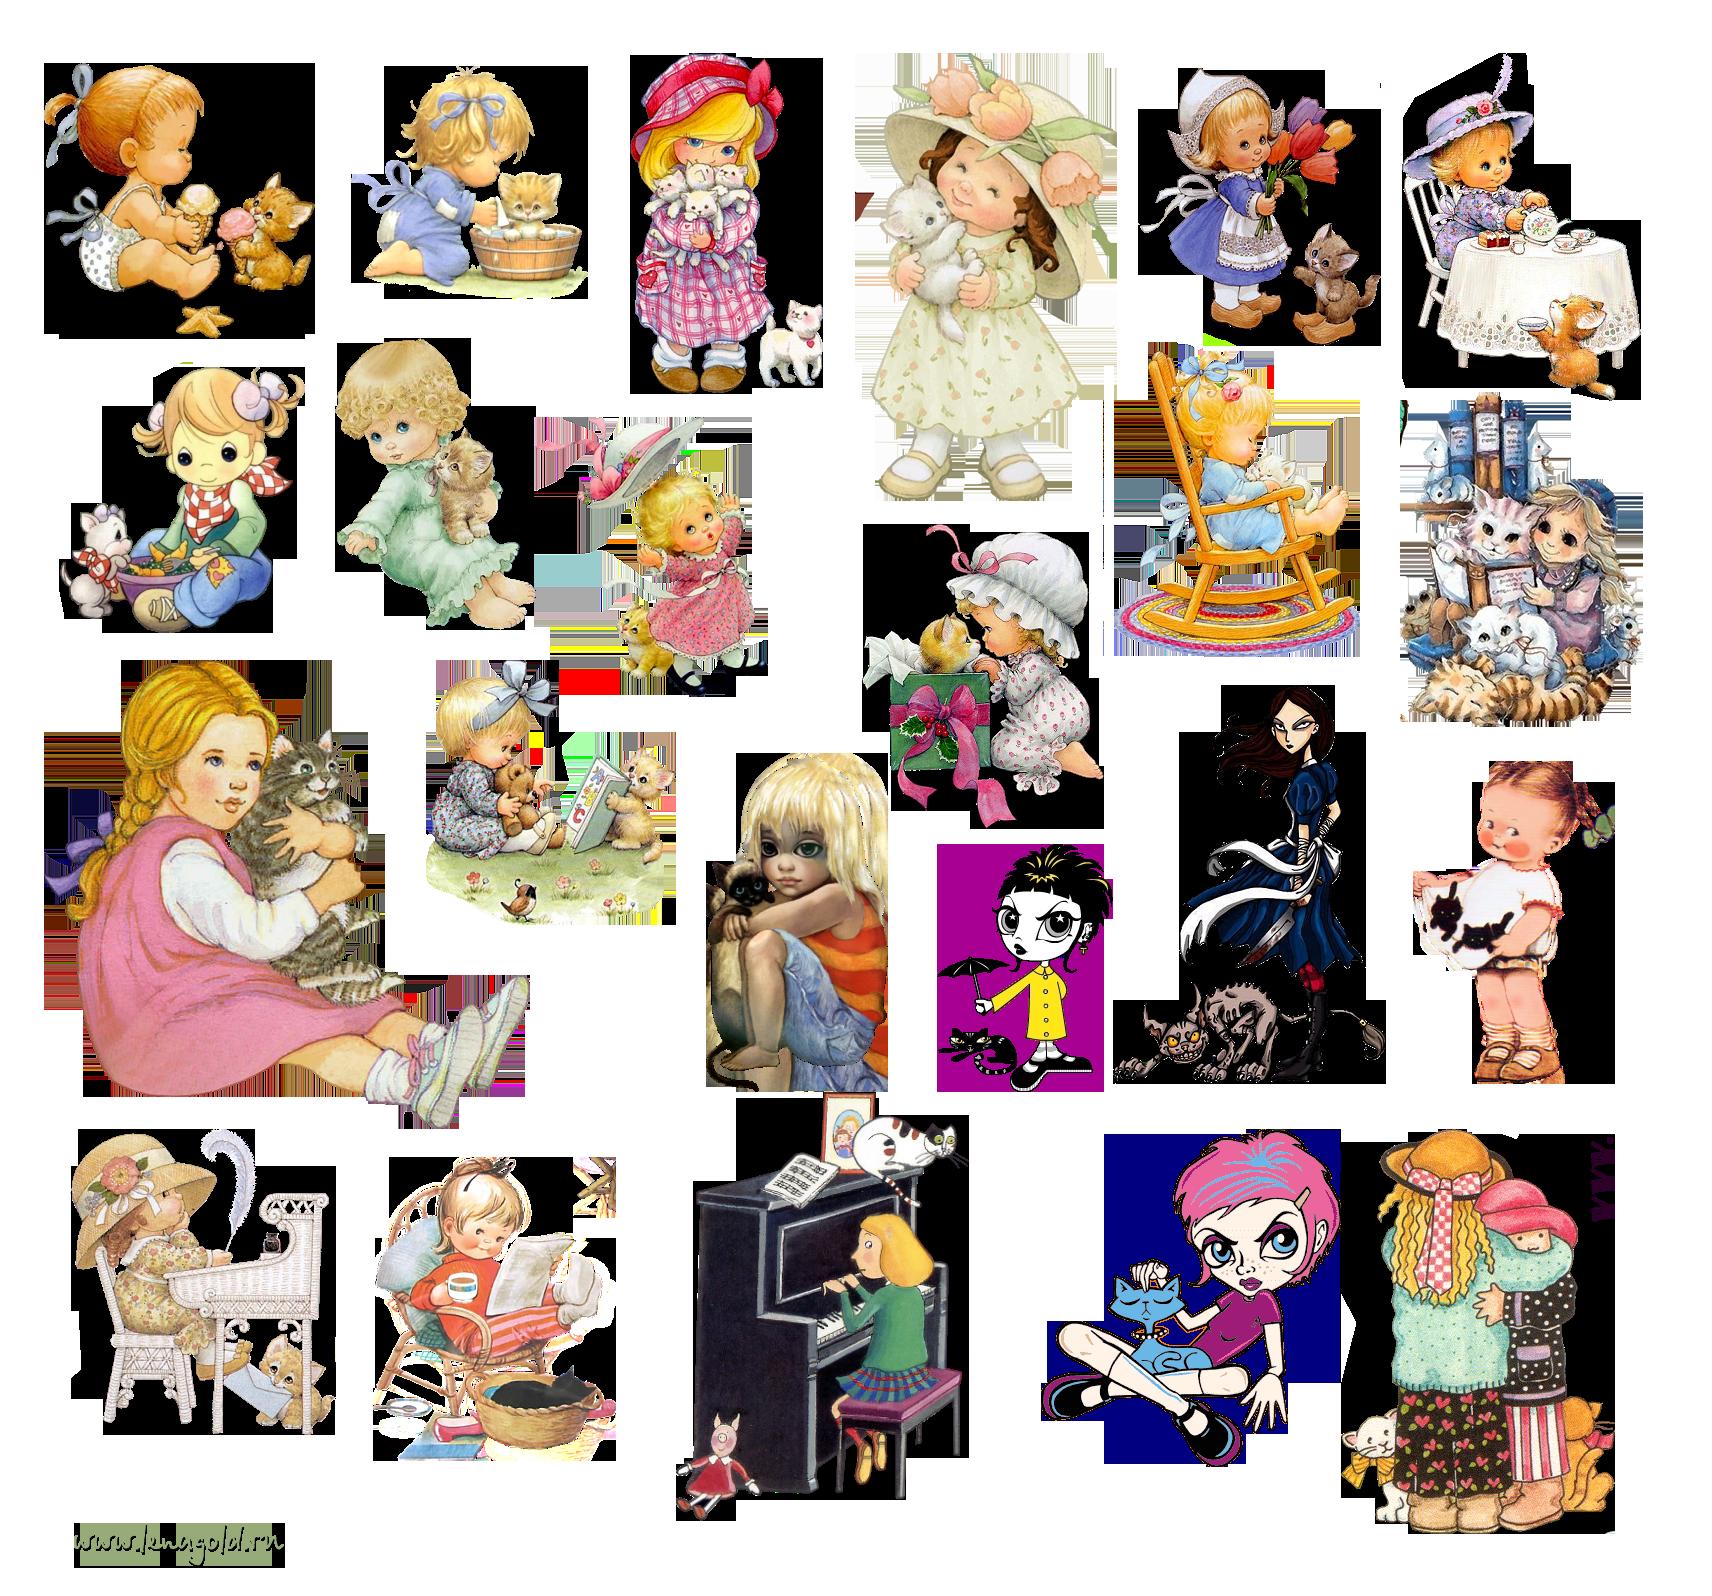 I:\детские картинки\картинки с празрачным фоном\20d7d00592c7.png